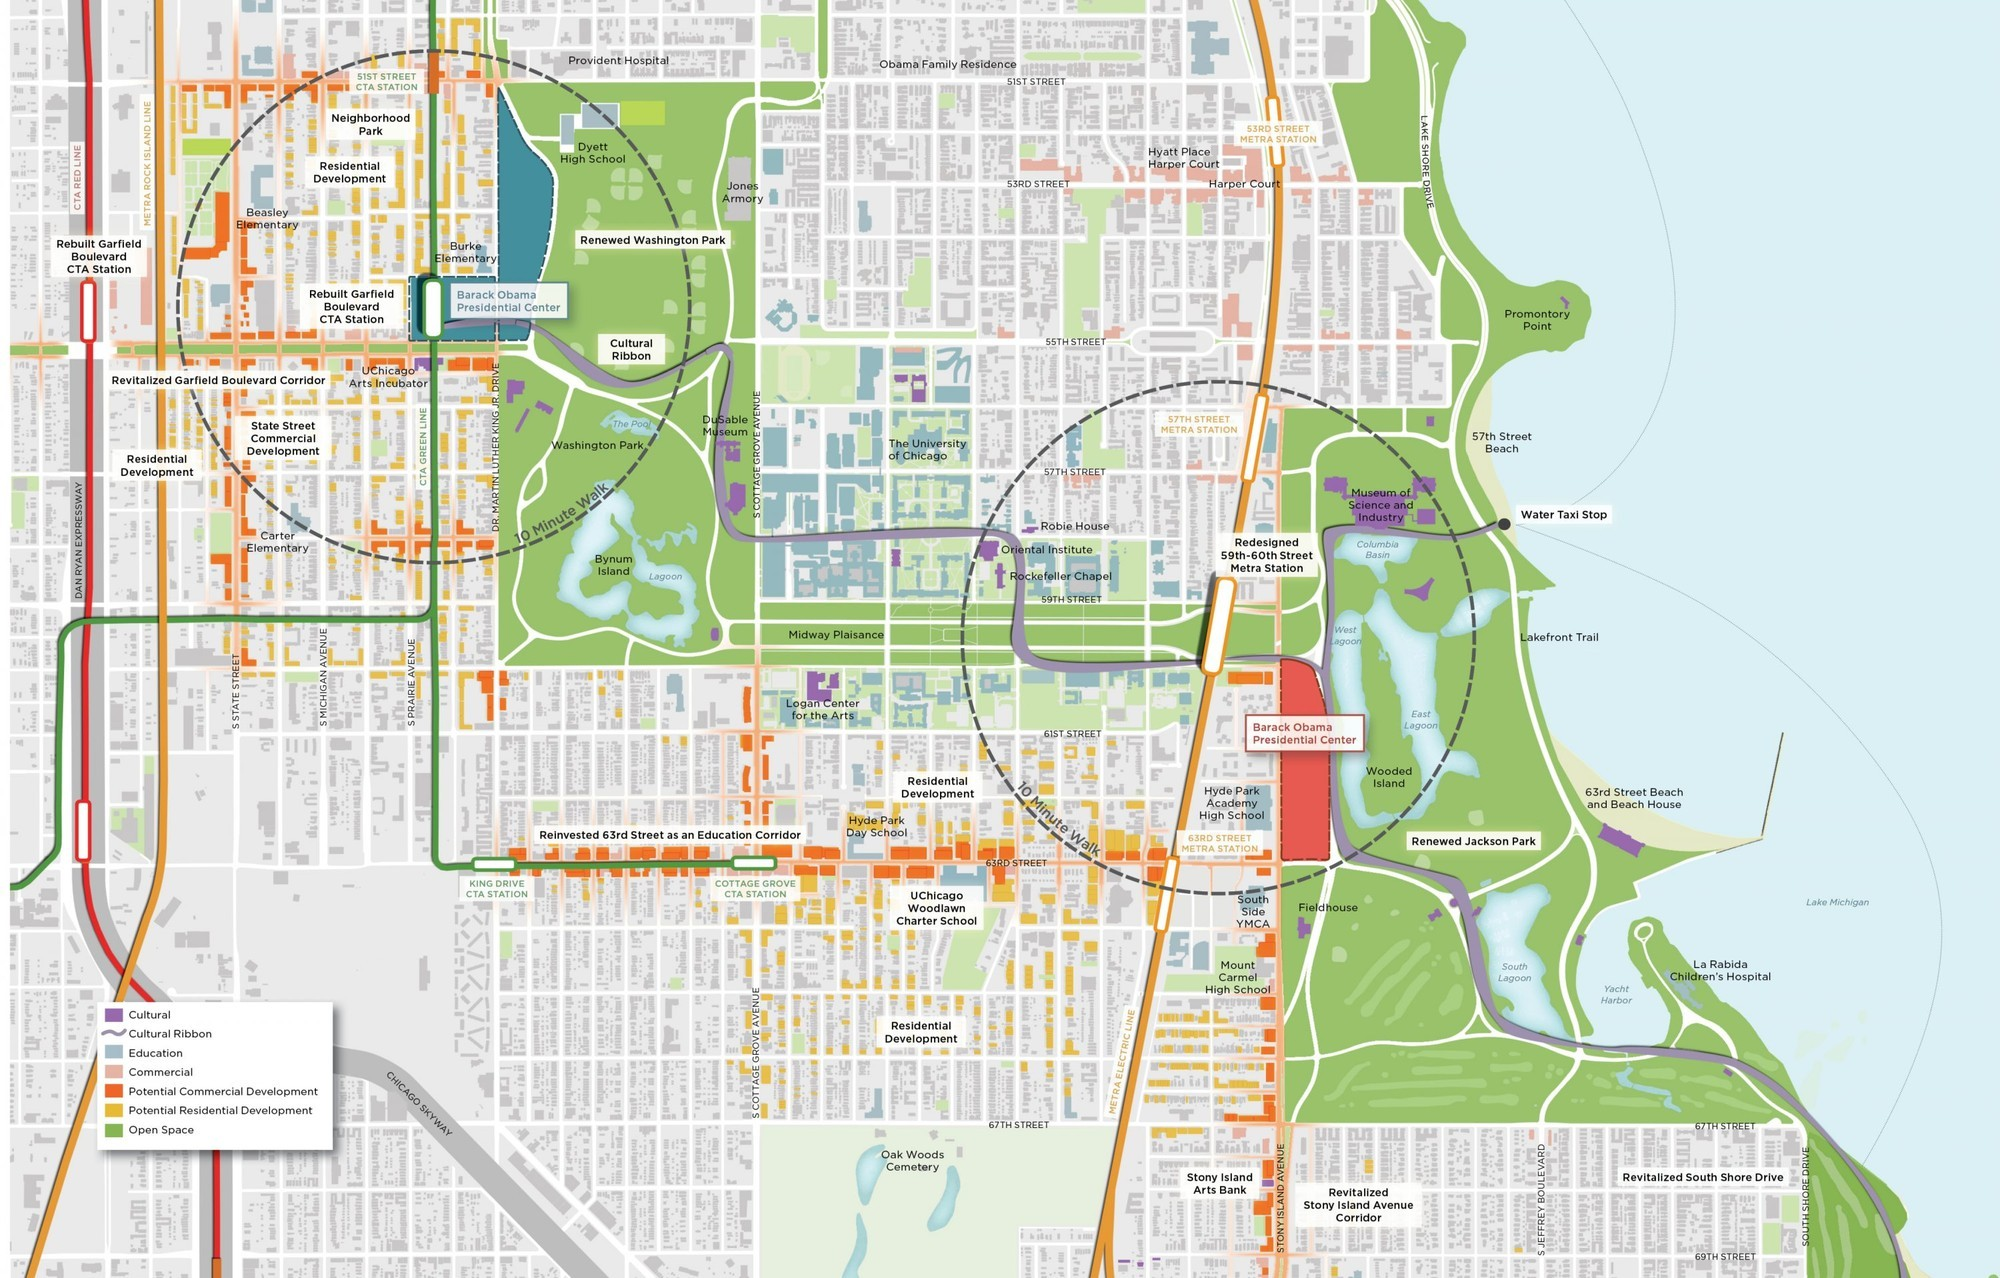 City Planning And Design Degree University Of Phoenix